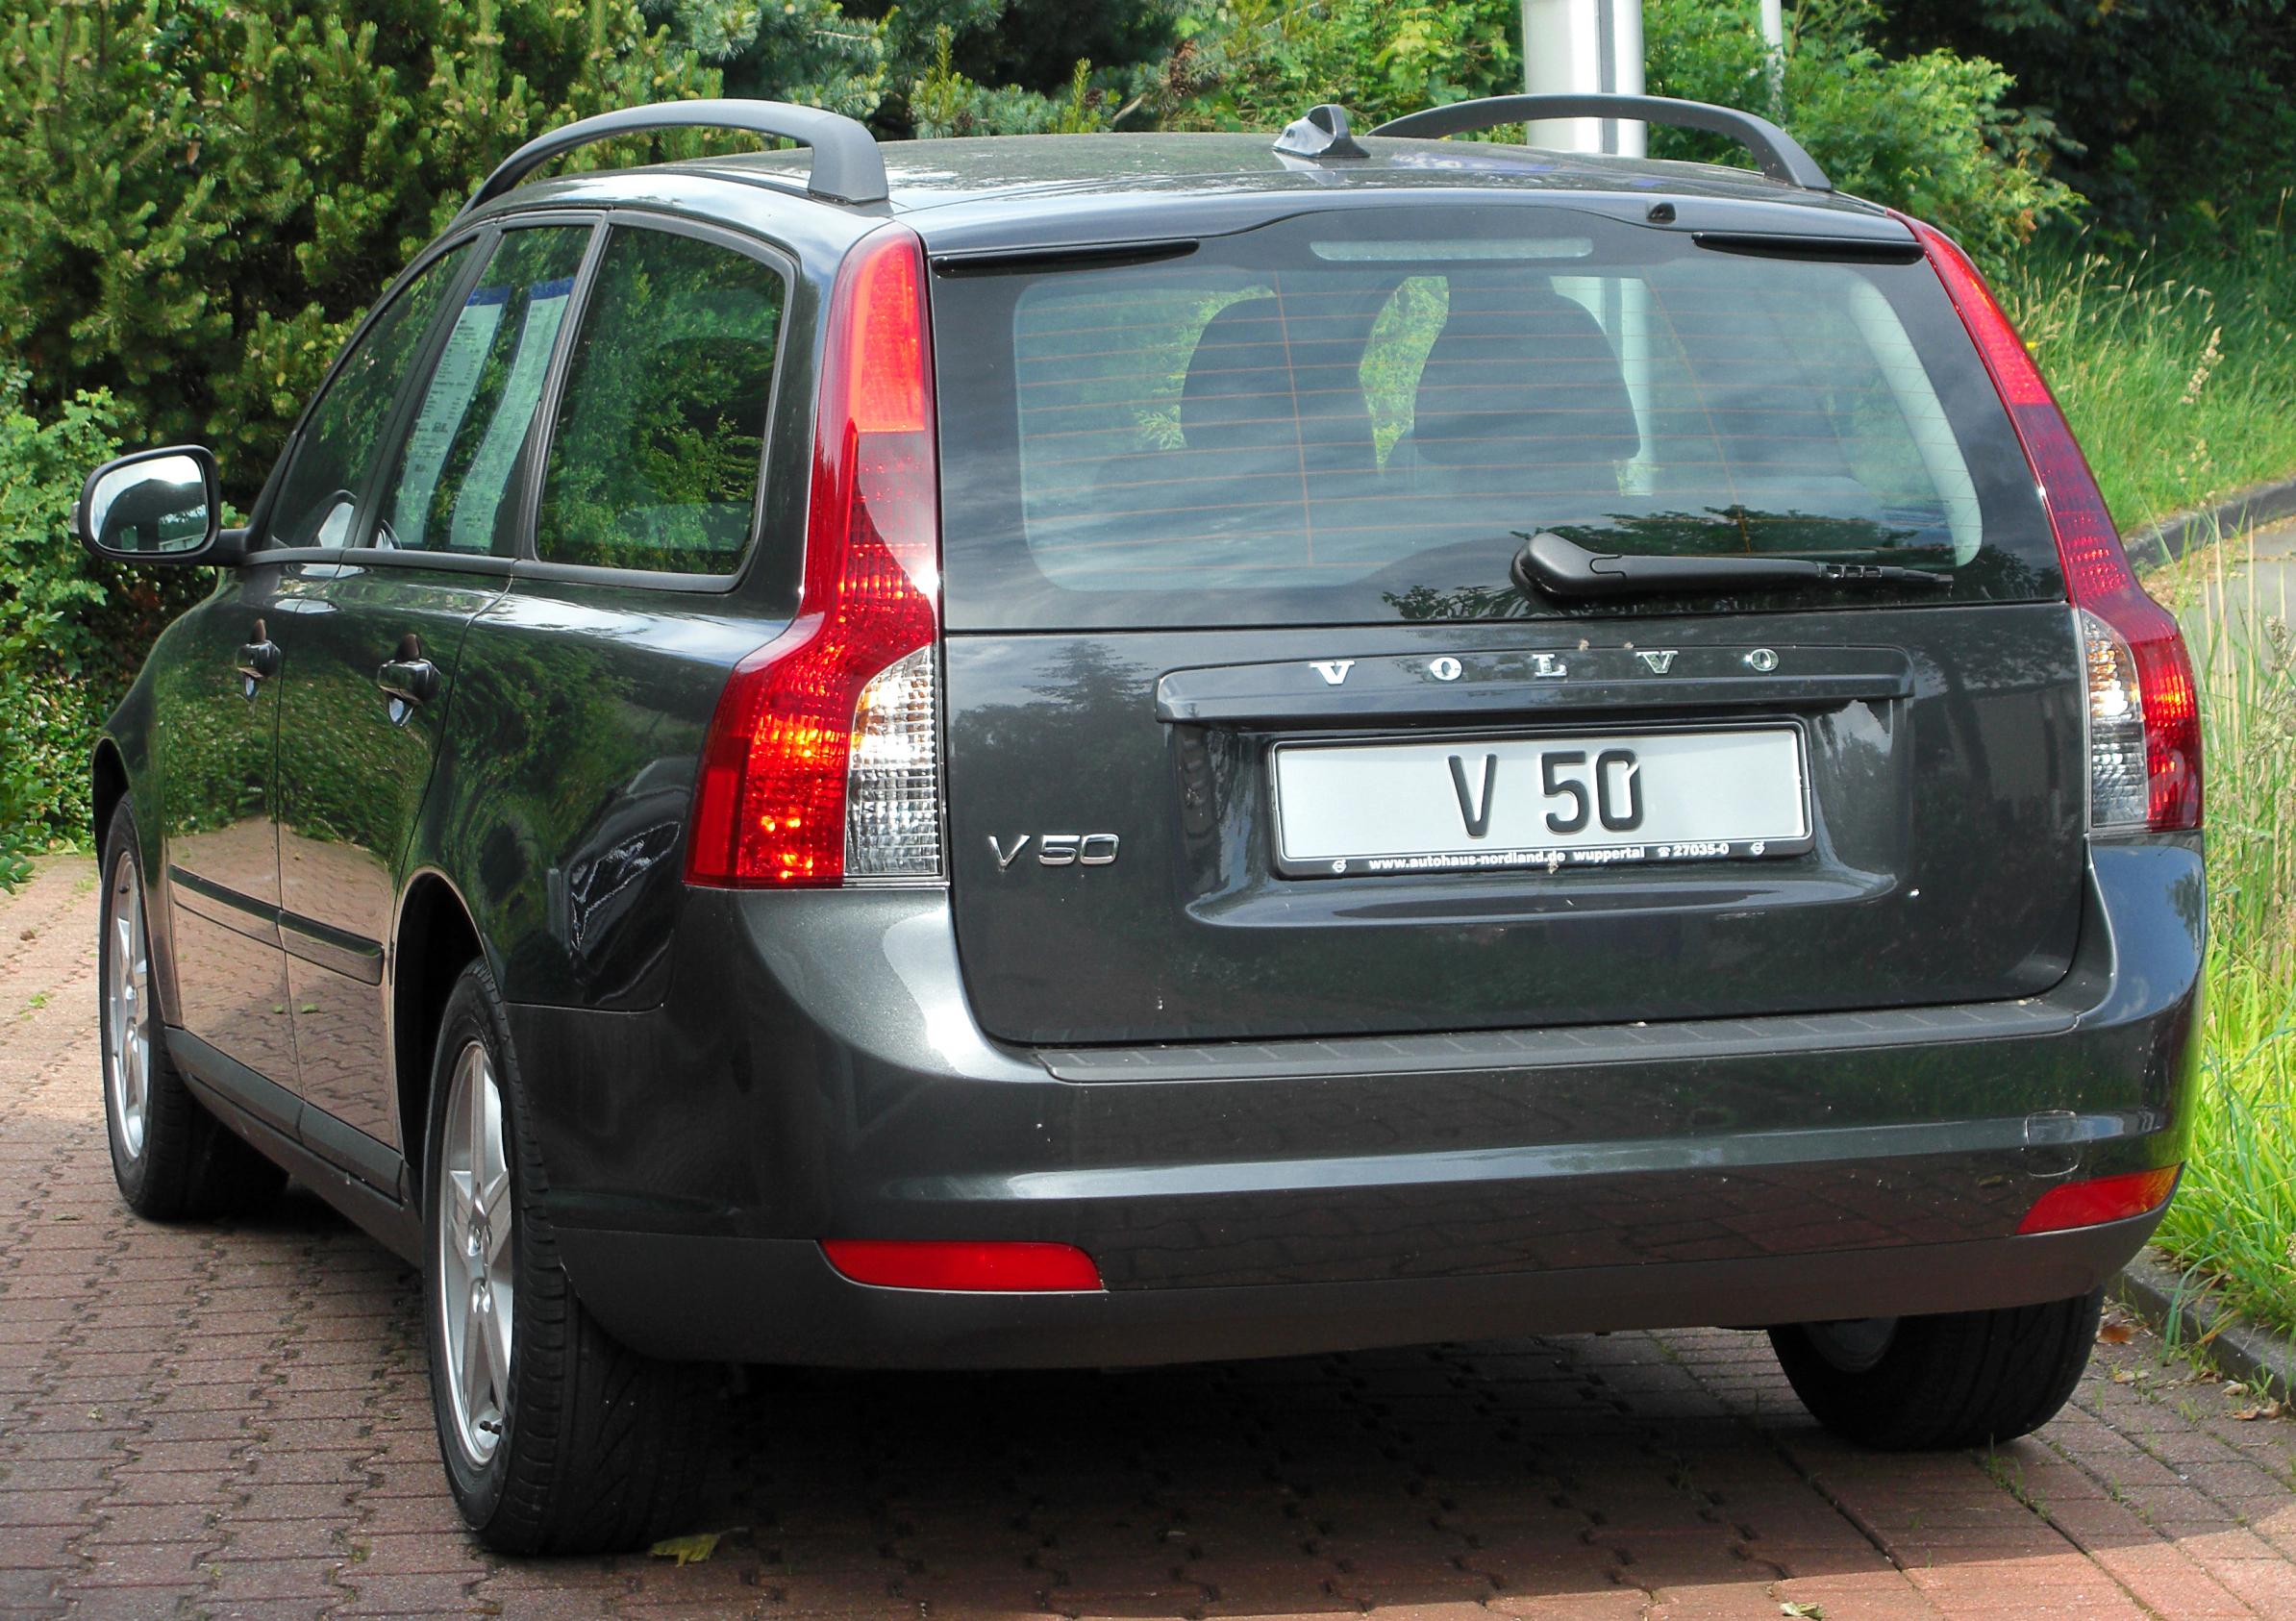 File:Volvo V50 2.0D Kinetic Facelift rear 20100613.jpg - Wikimedia Commons